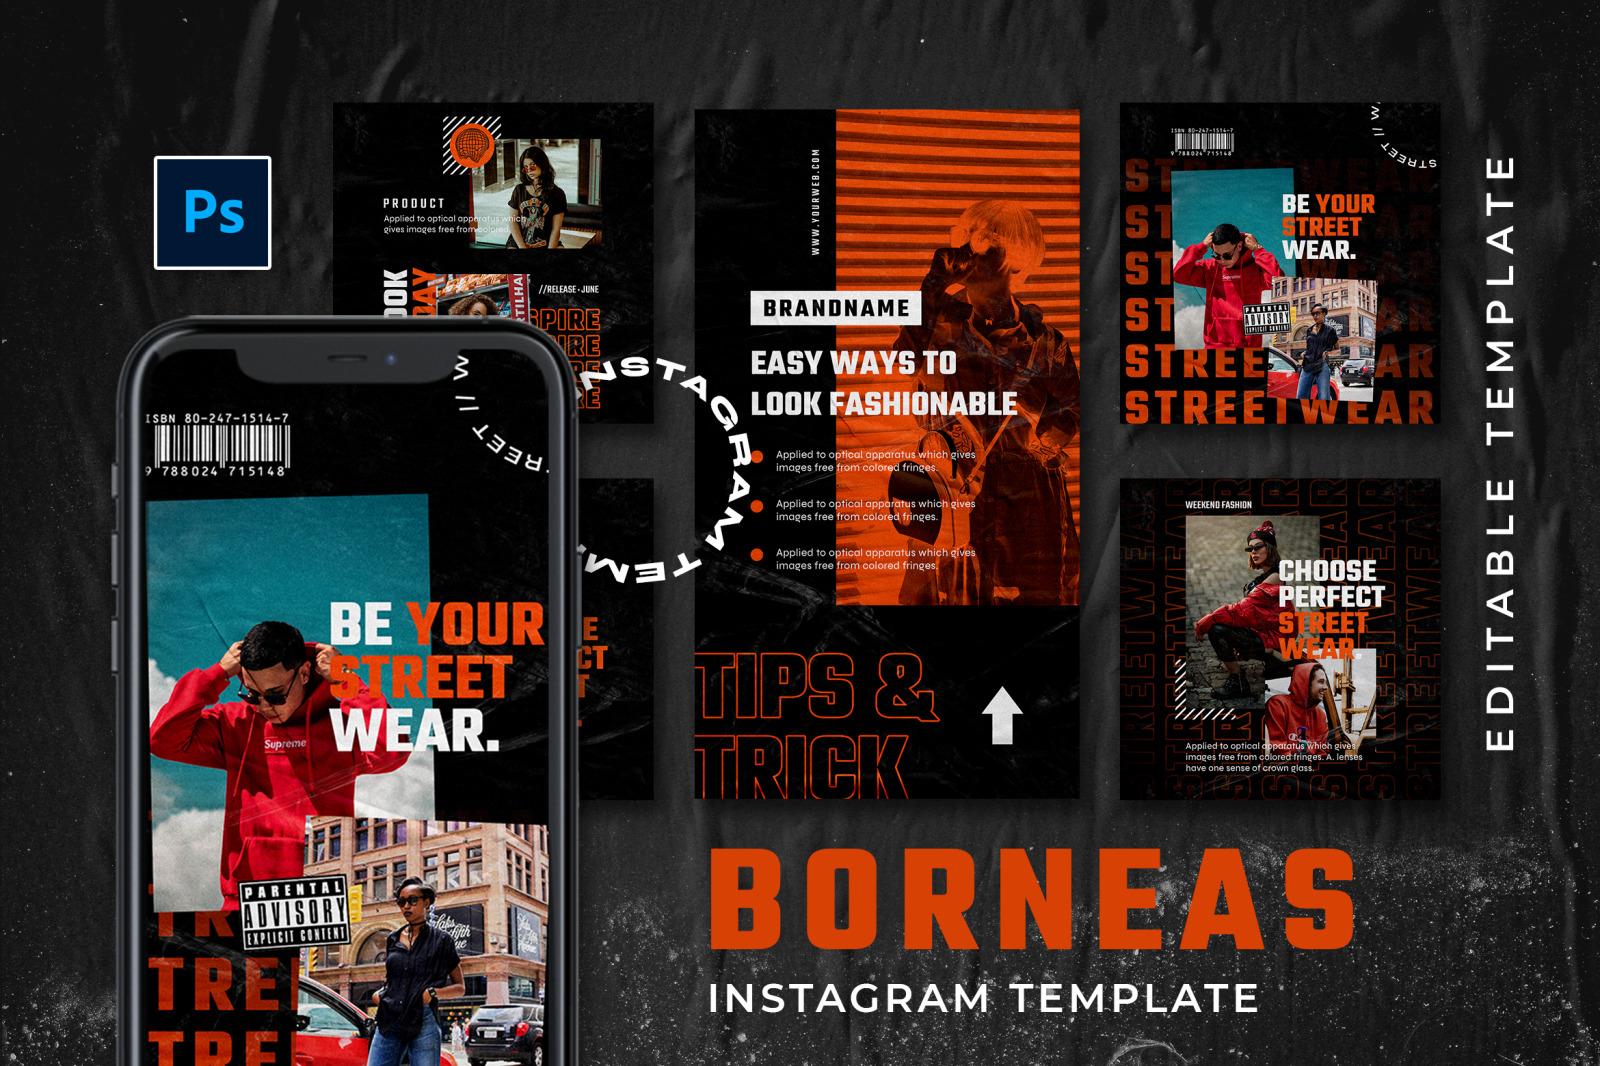 Borneas Instagram Template